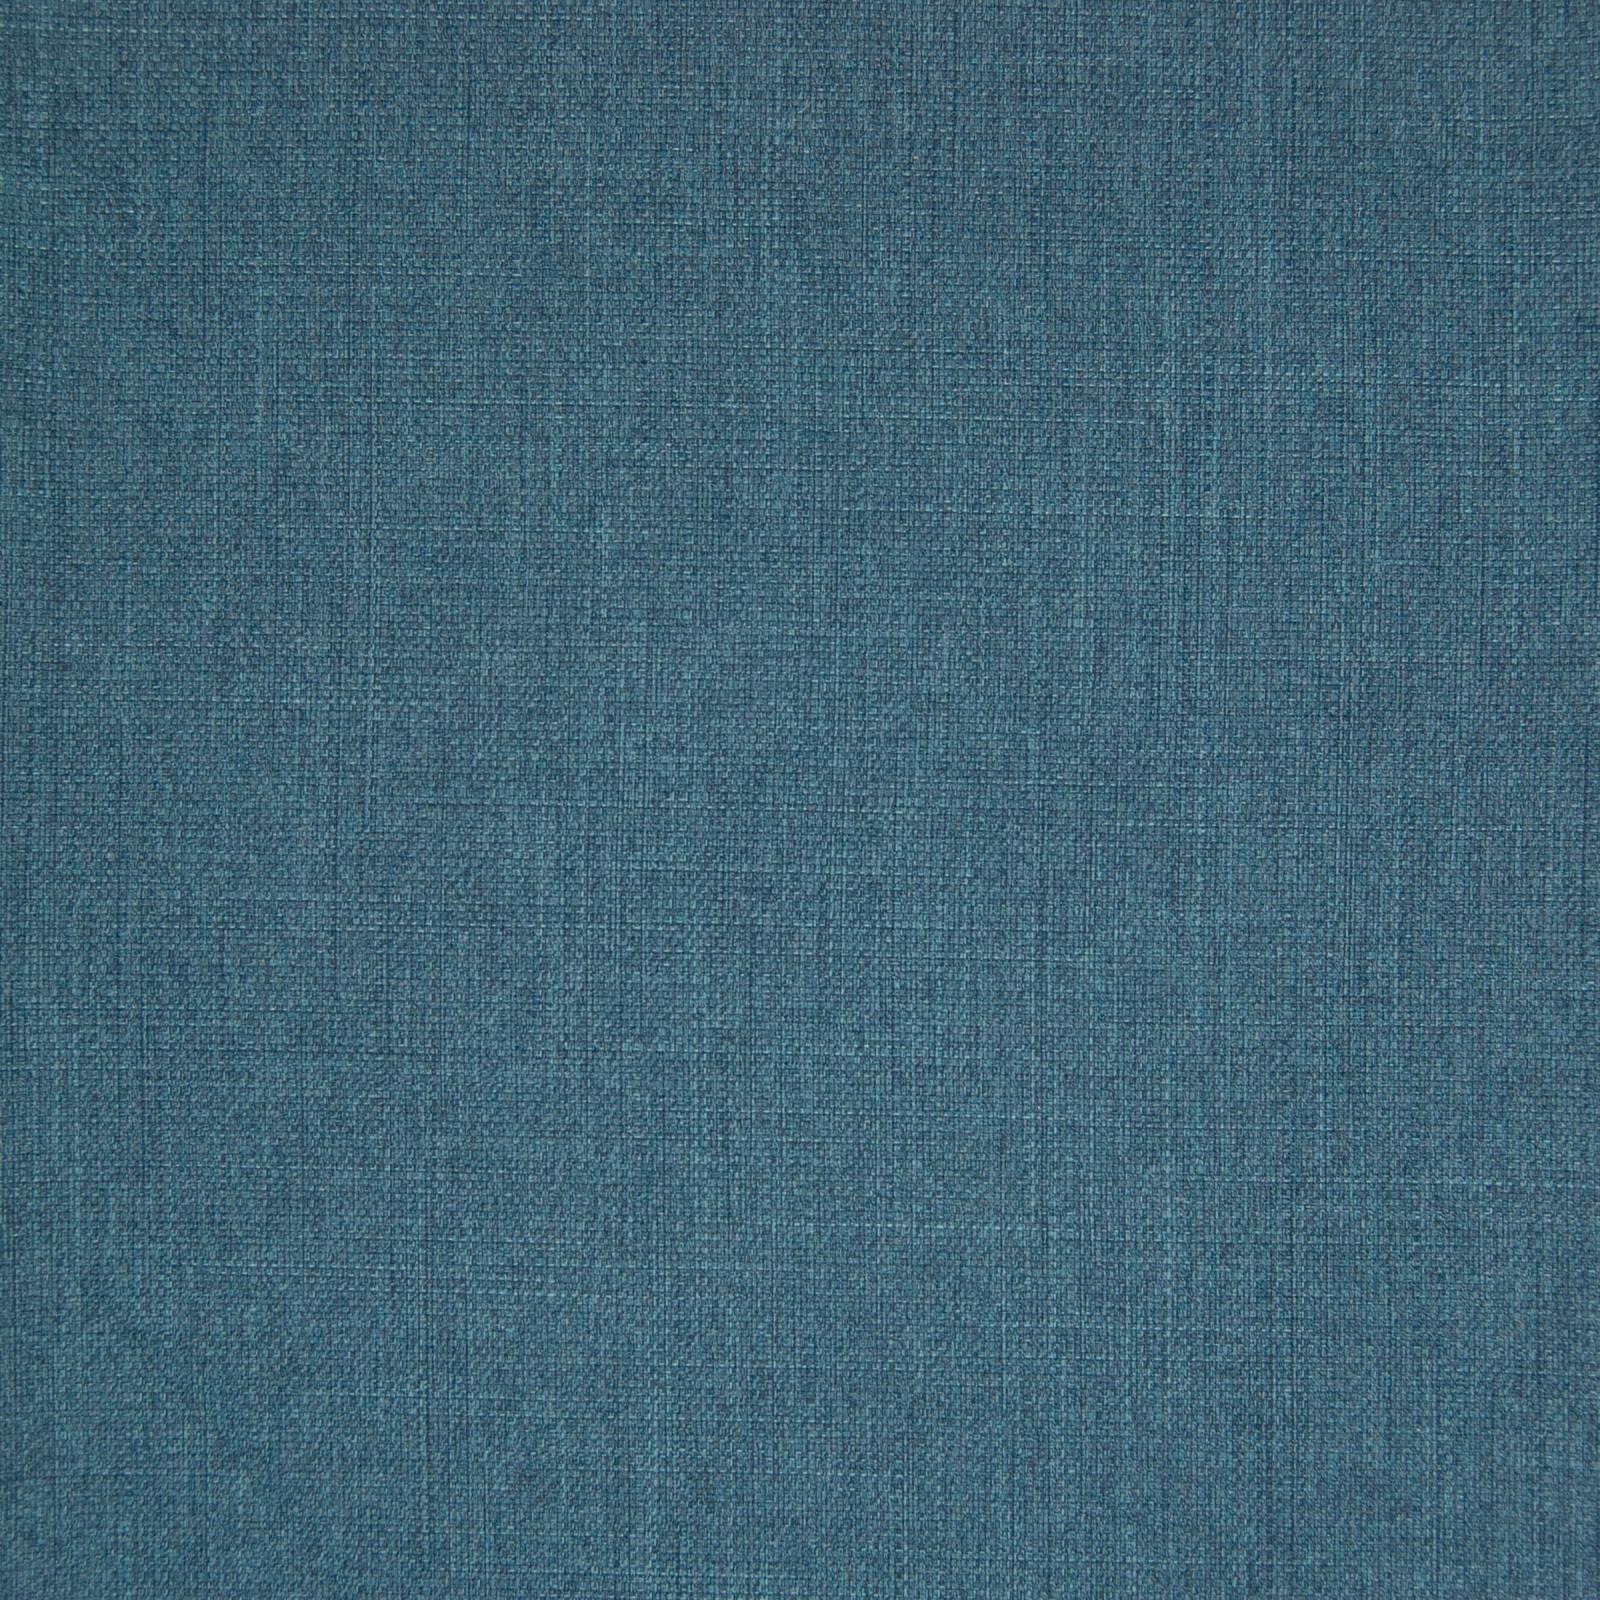 B7164 Peacock Greenhouse Fabrics